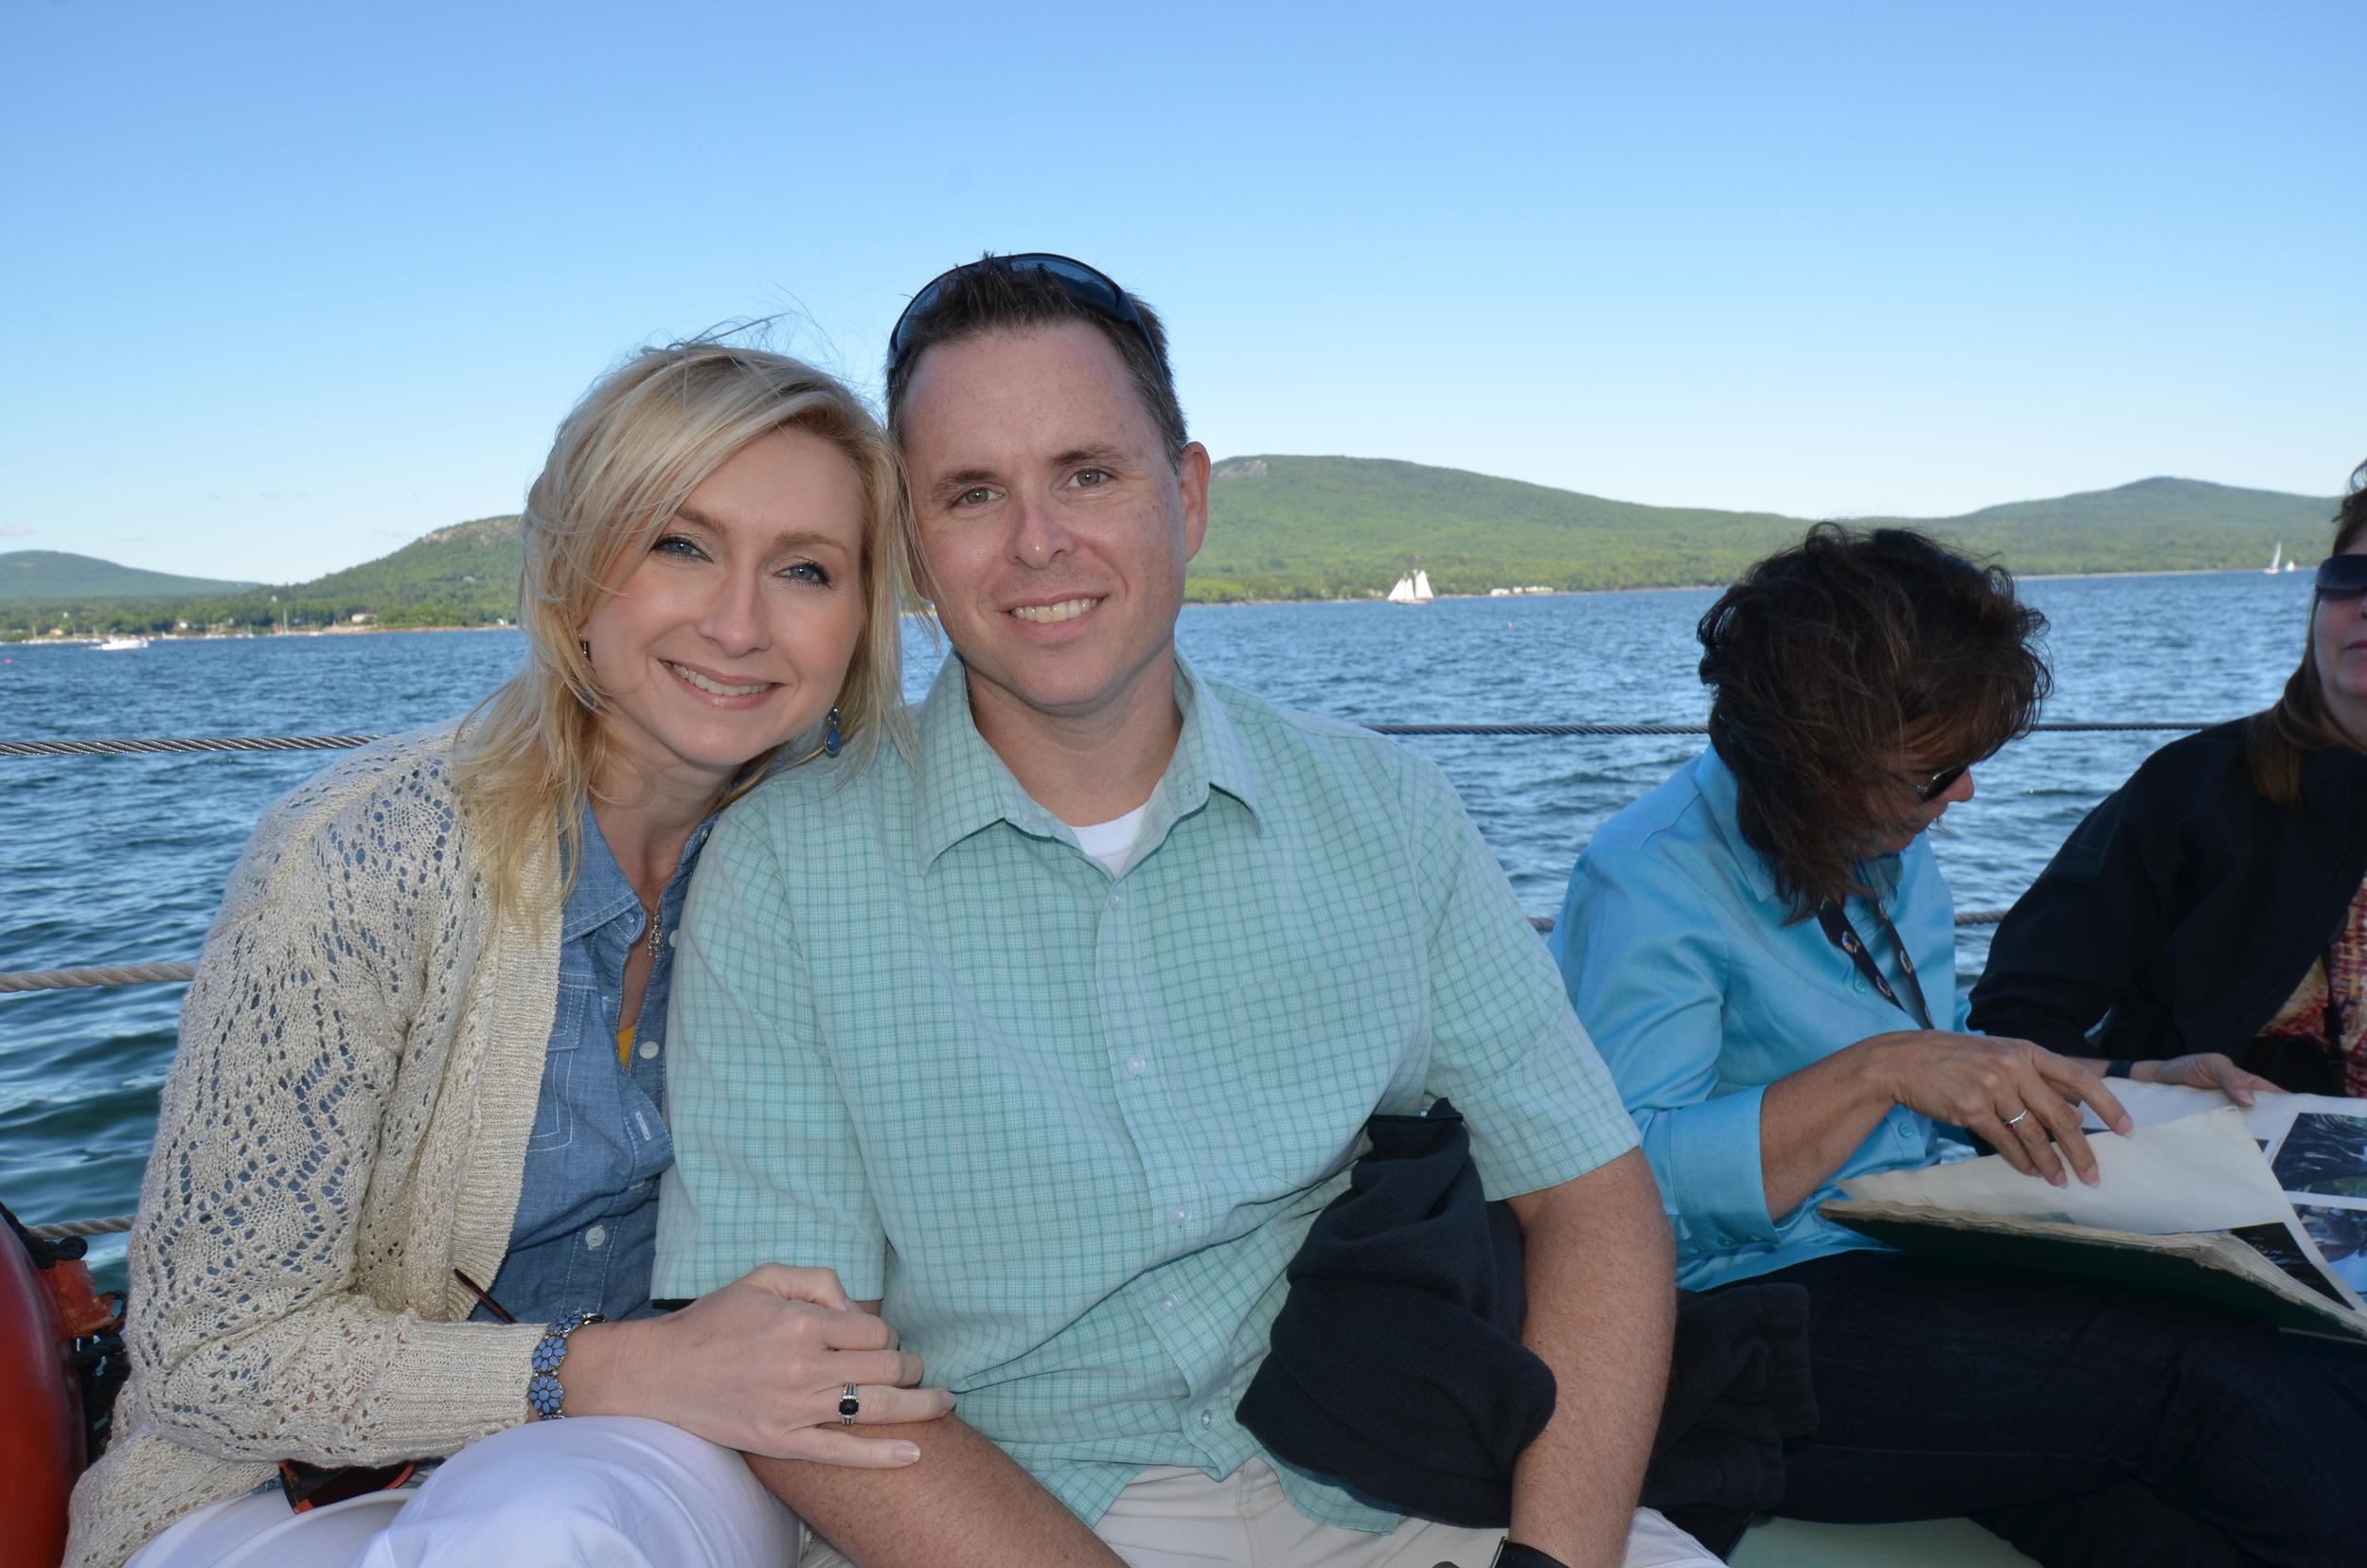 Jason & Amanda in Maine